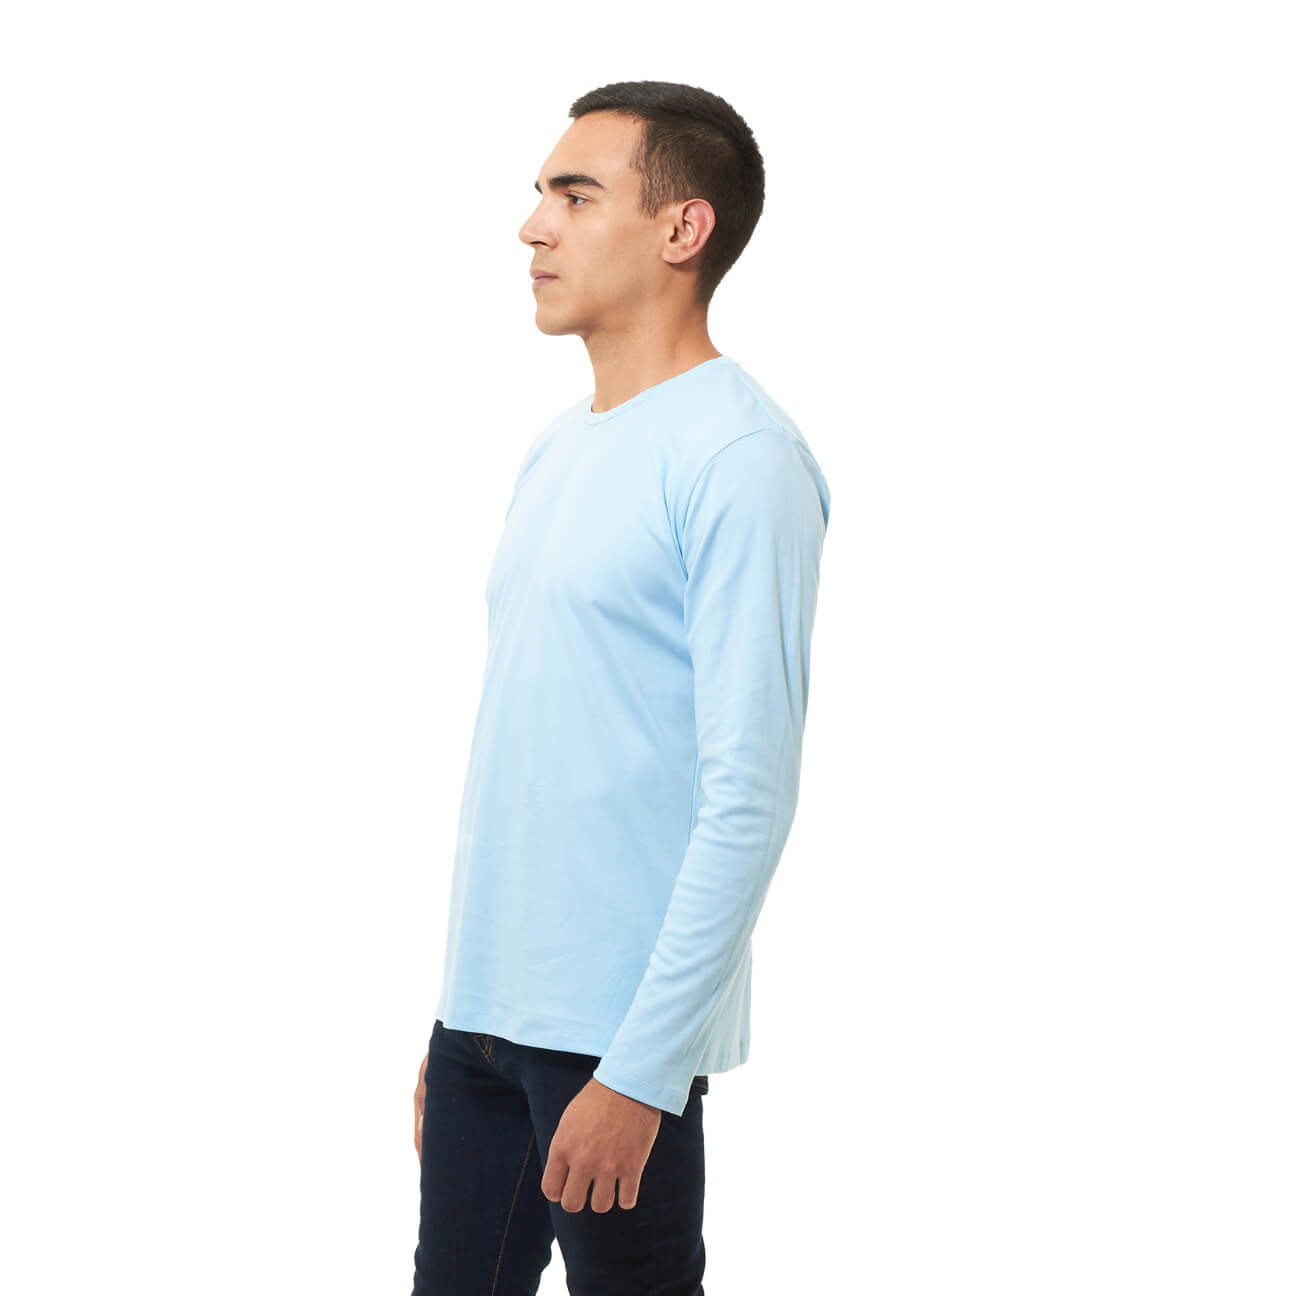 Franela basica caballero manga larga azul claro lado